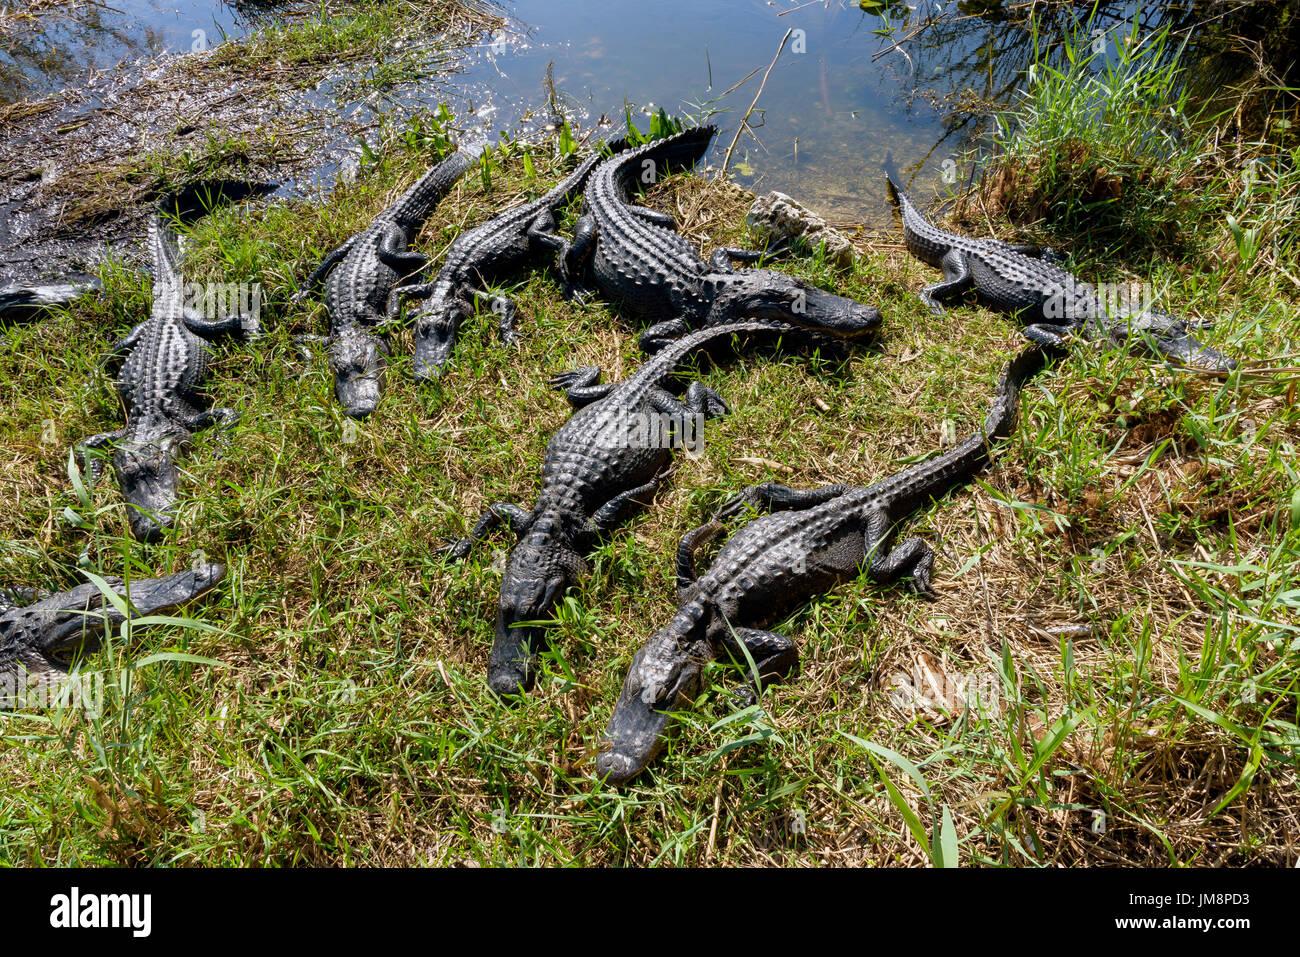 American alligators (Alligator mississippiensis) basking, Anhinga Trail, Everglades National Park, Florida, USA - Stock Image